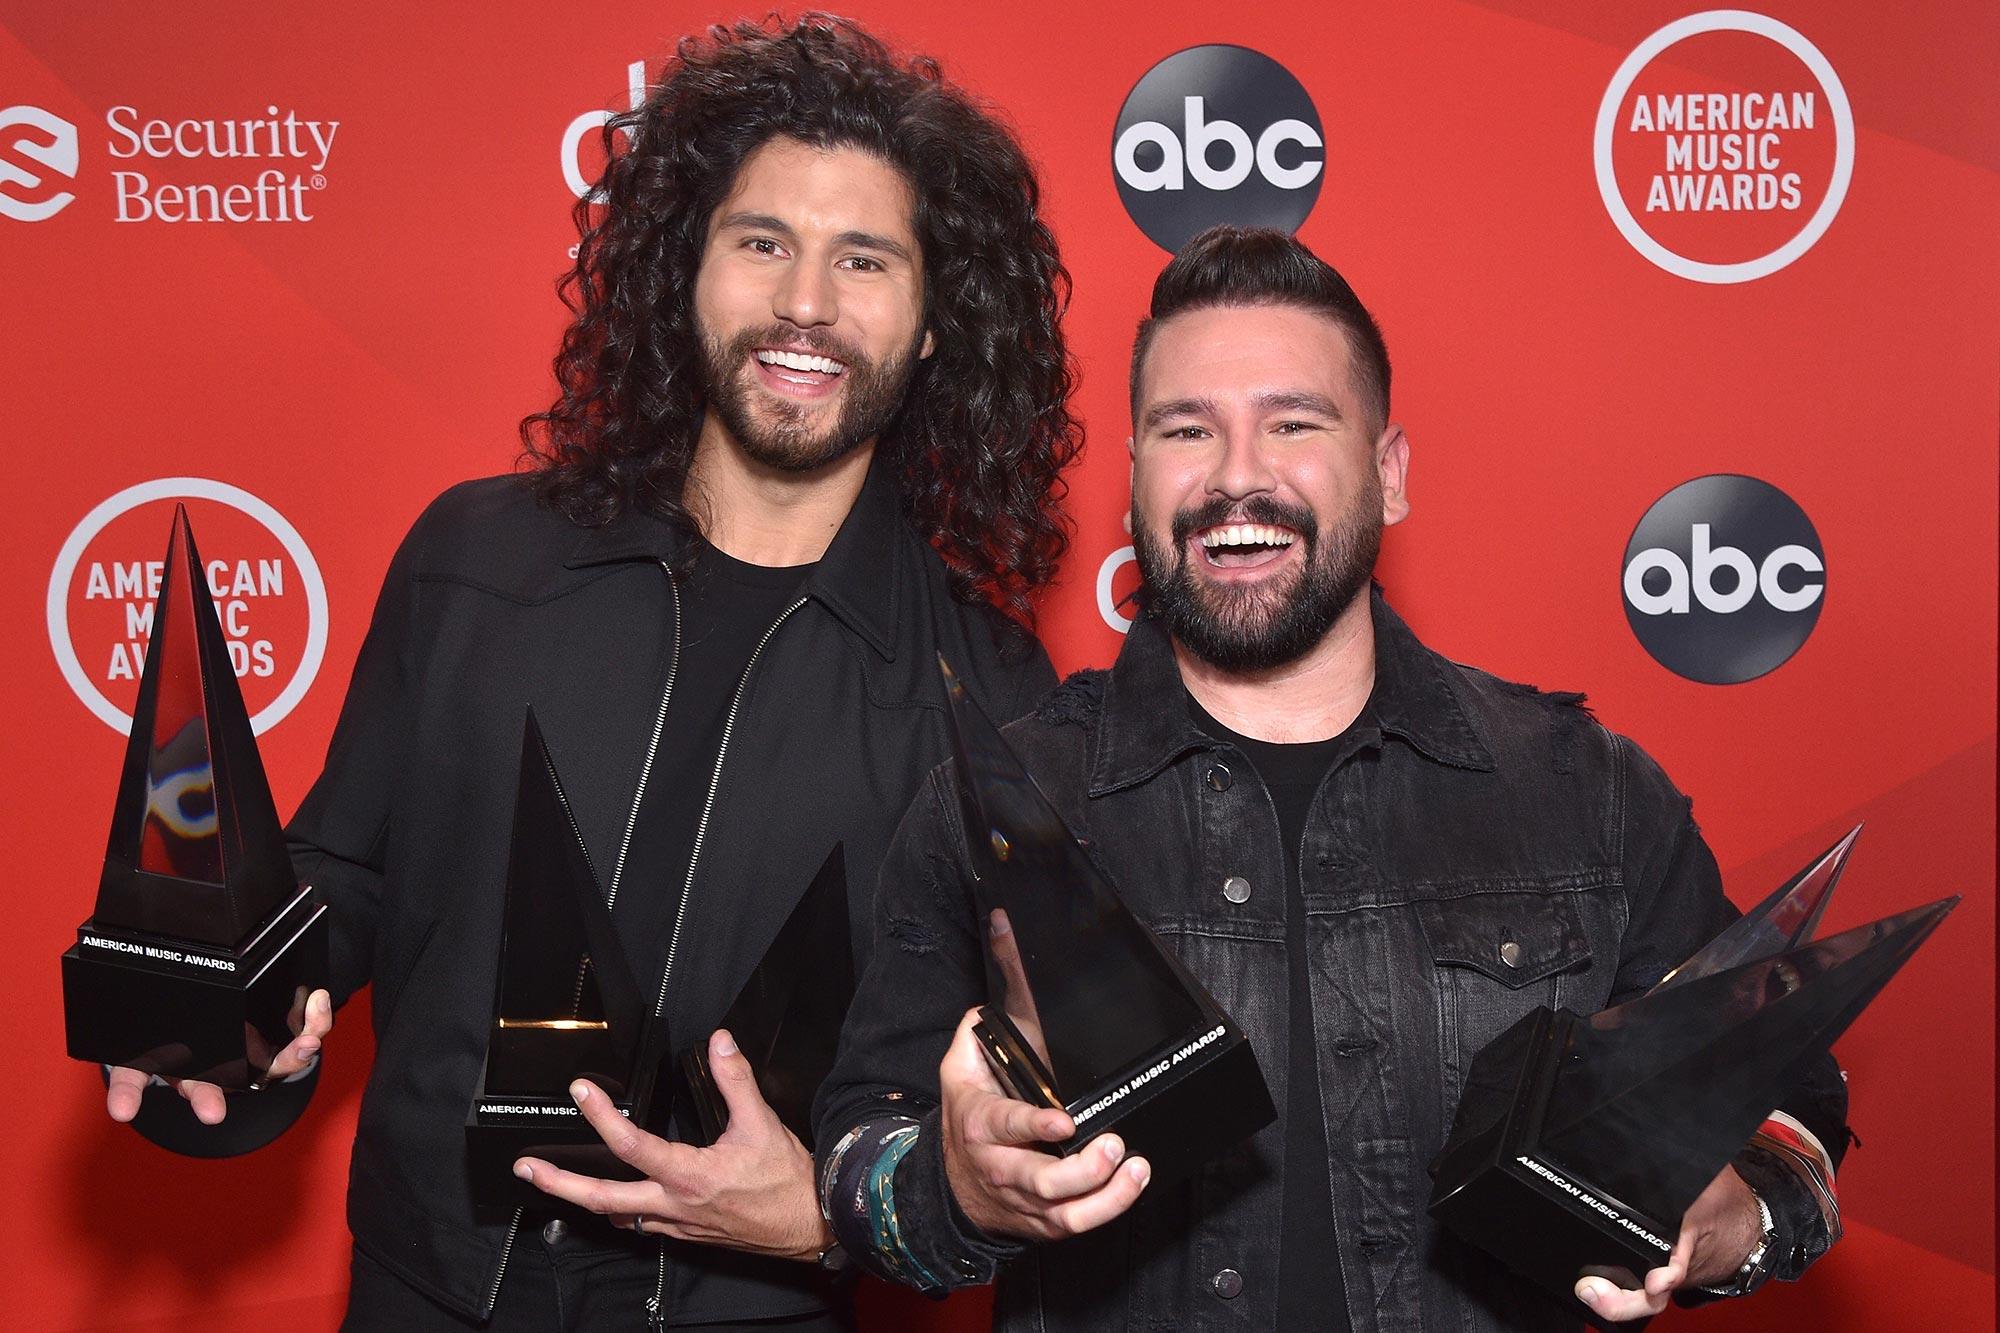 American Music Awards Winners List